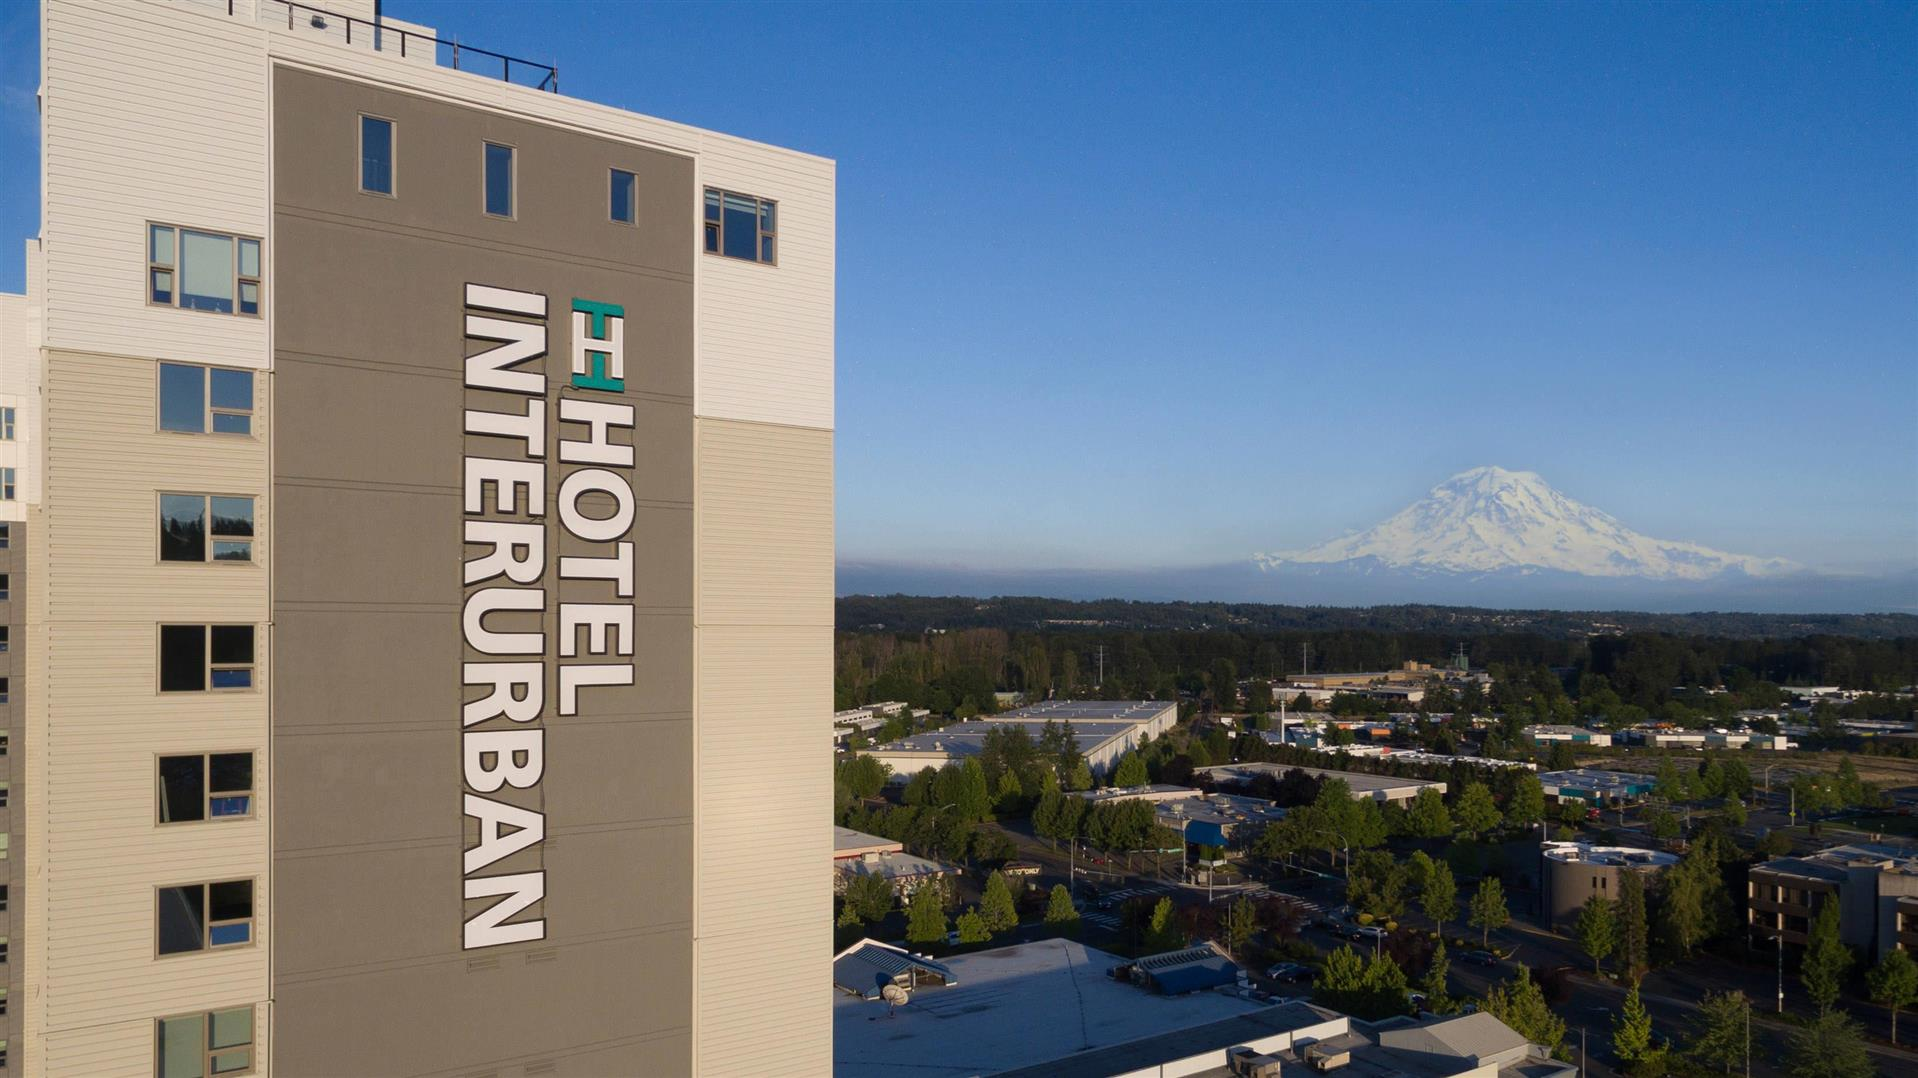 Meetings and events at Hotel Interurban, Tukwila, WA, US